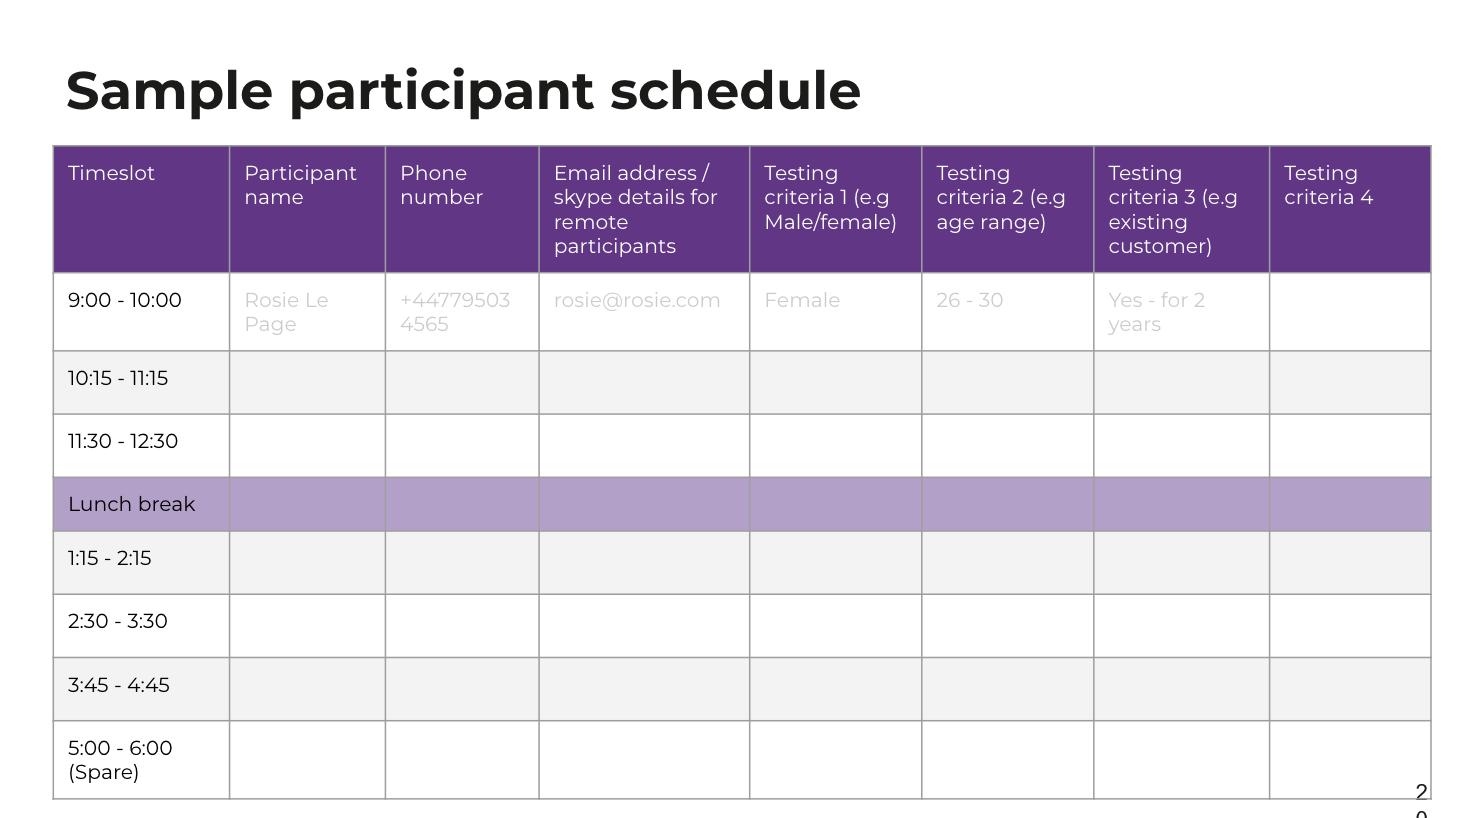 Sample participant schedule